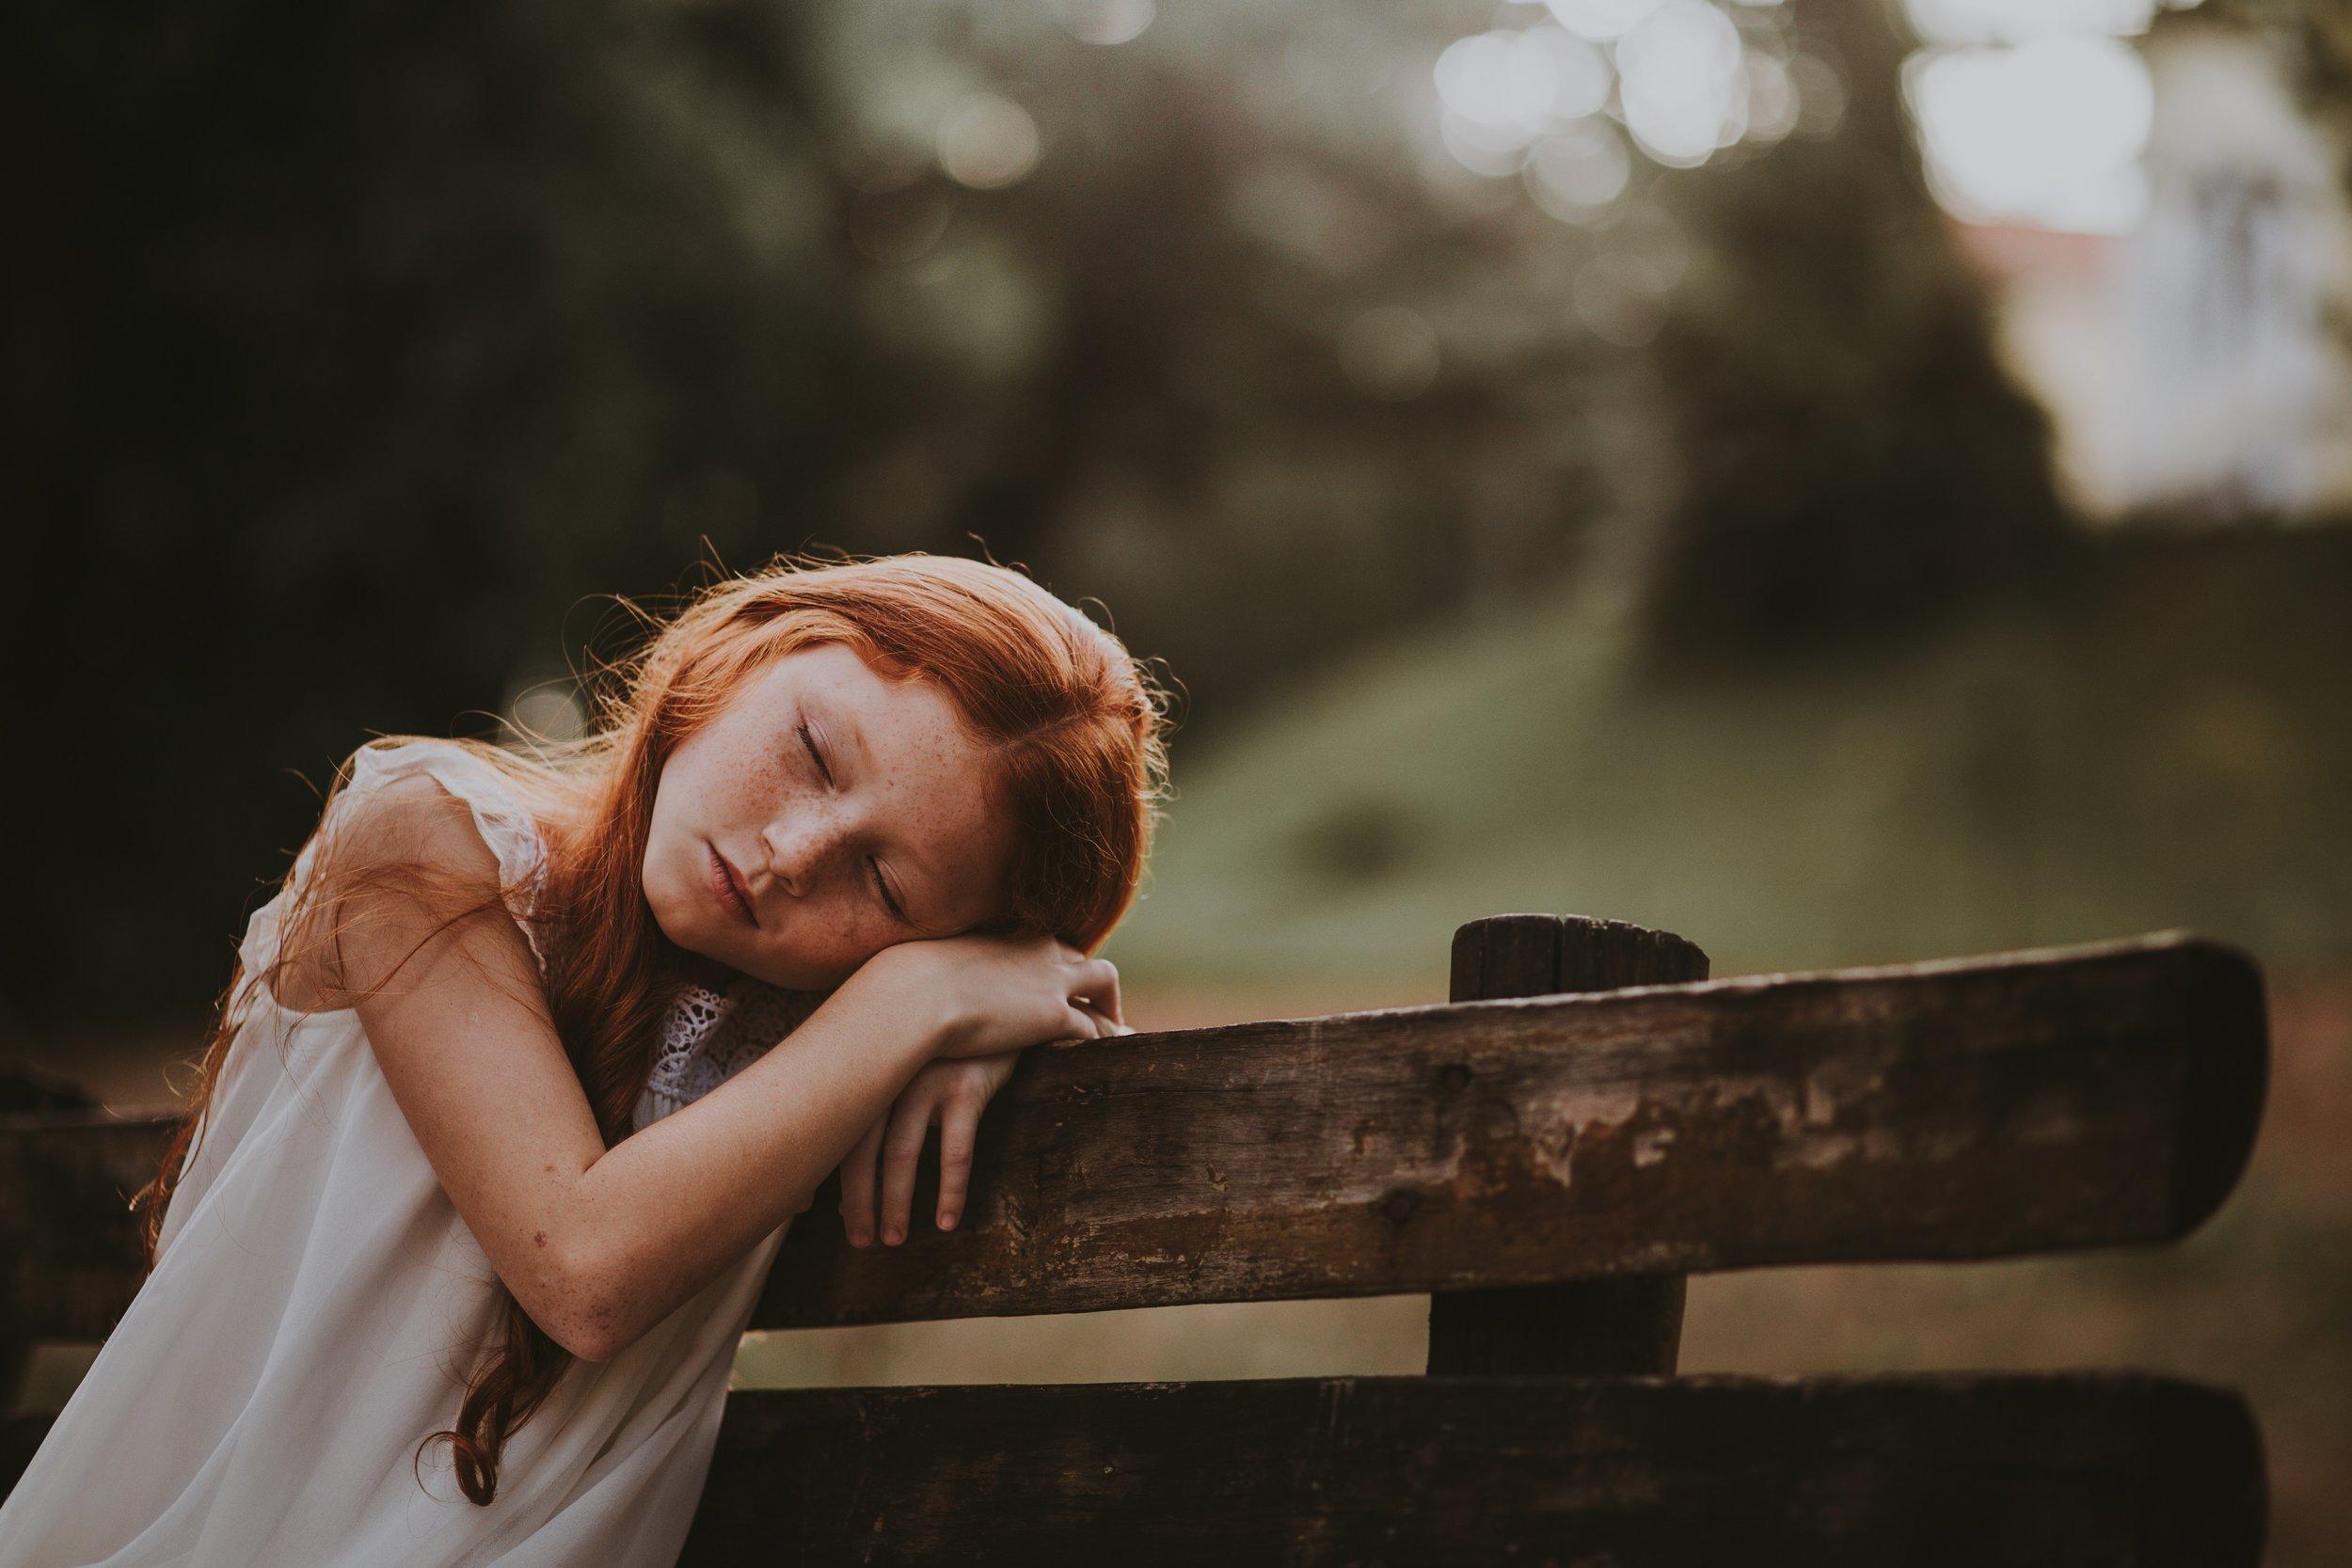 adorable-blur-child-573253.jpg